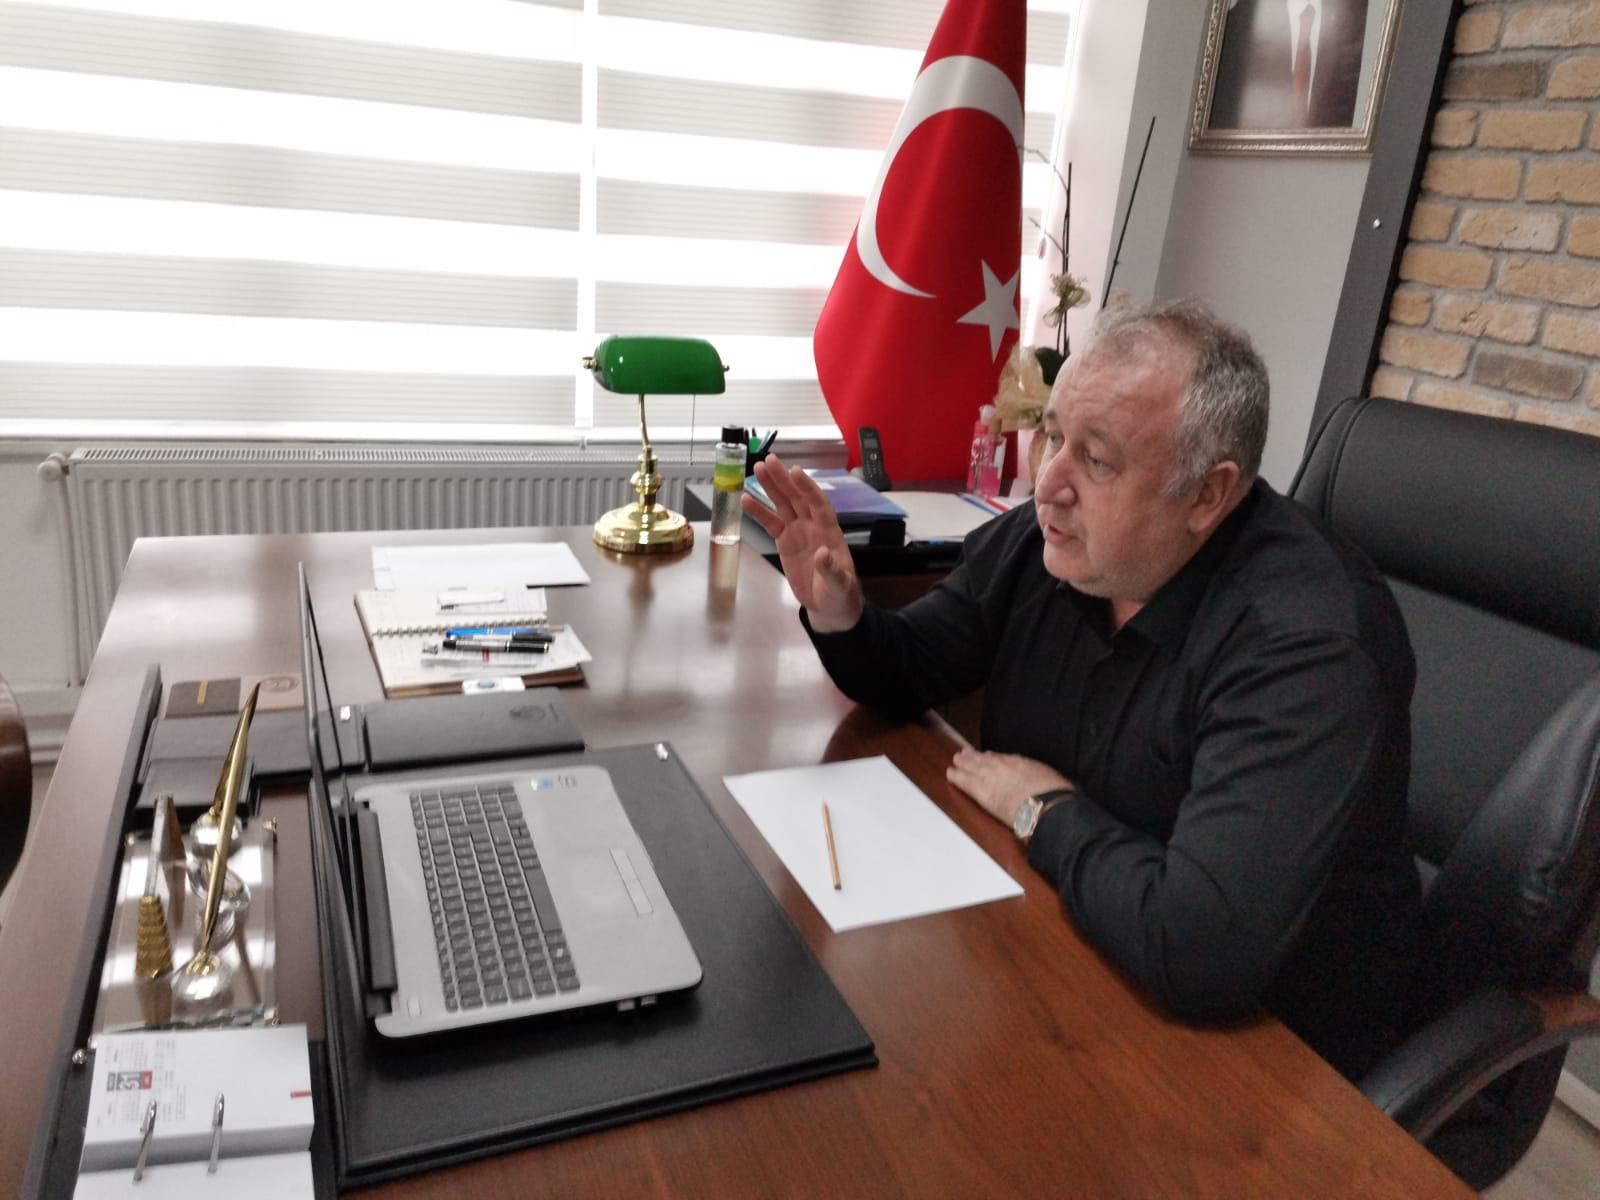 Başkan miniklerle telekonferansta